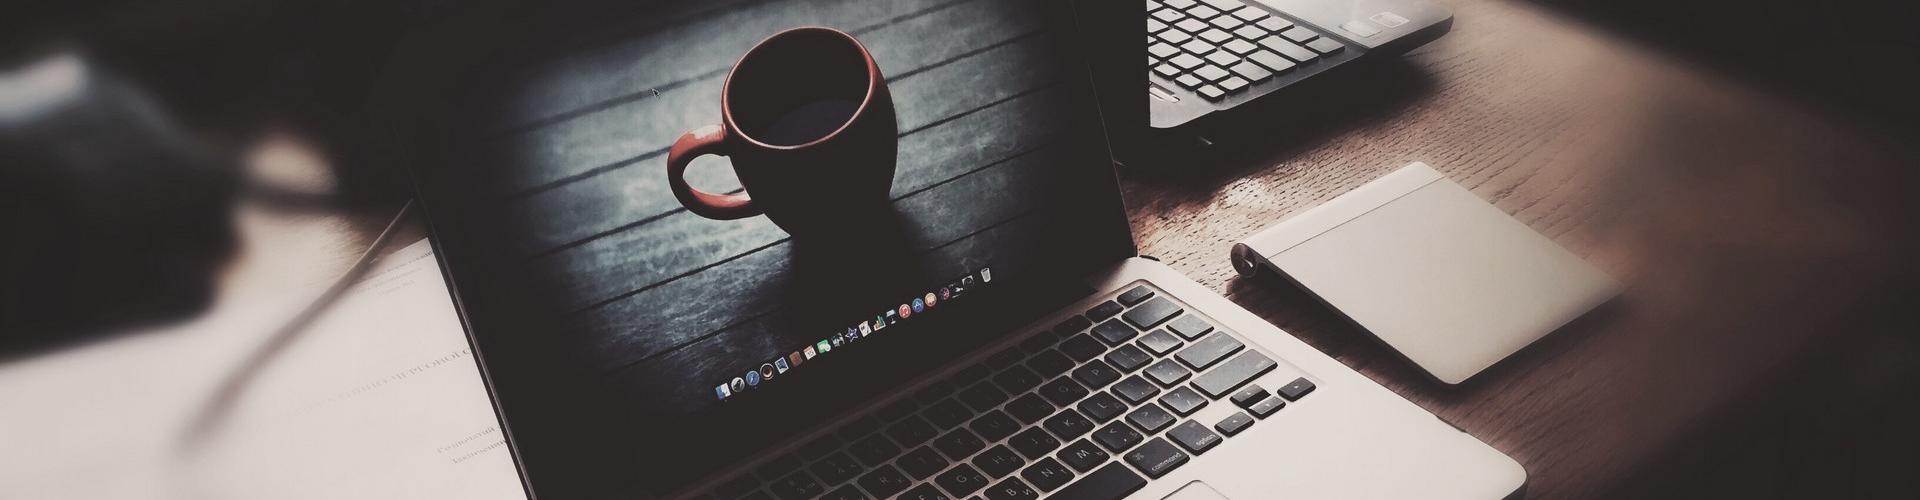 IOS12苹果手机免越狱虚拟定位软件的使用